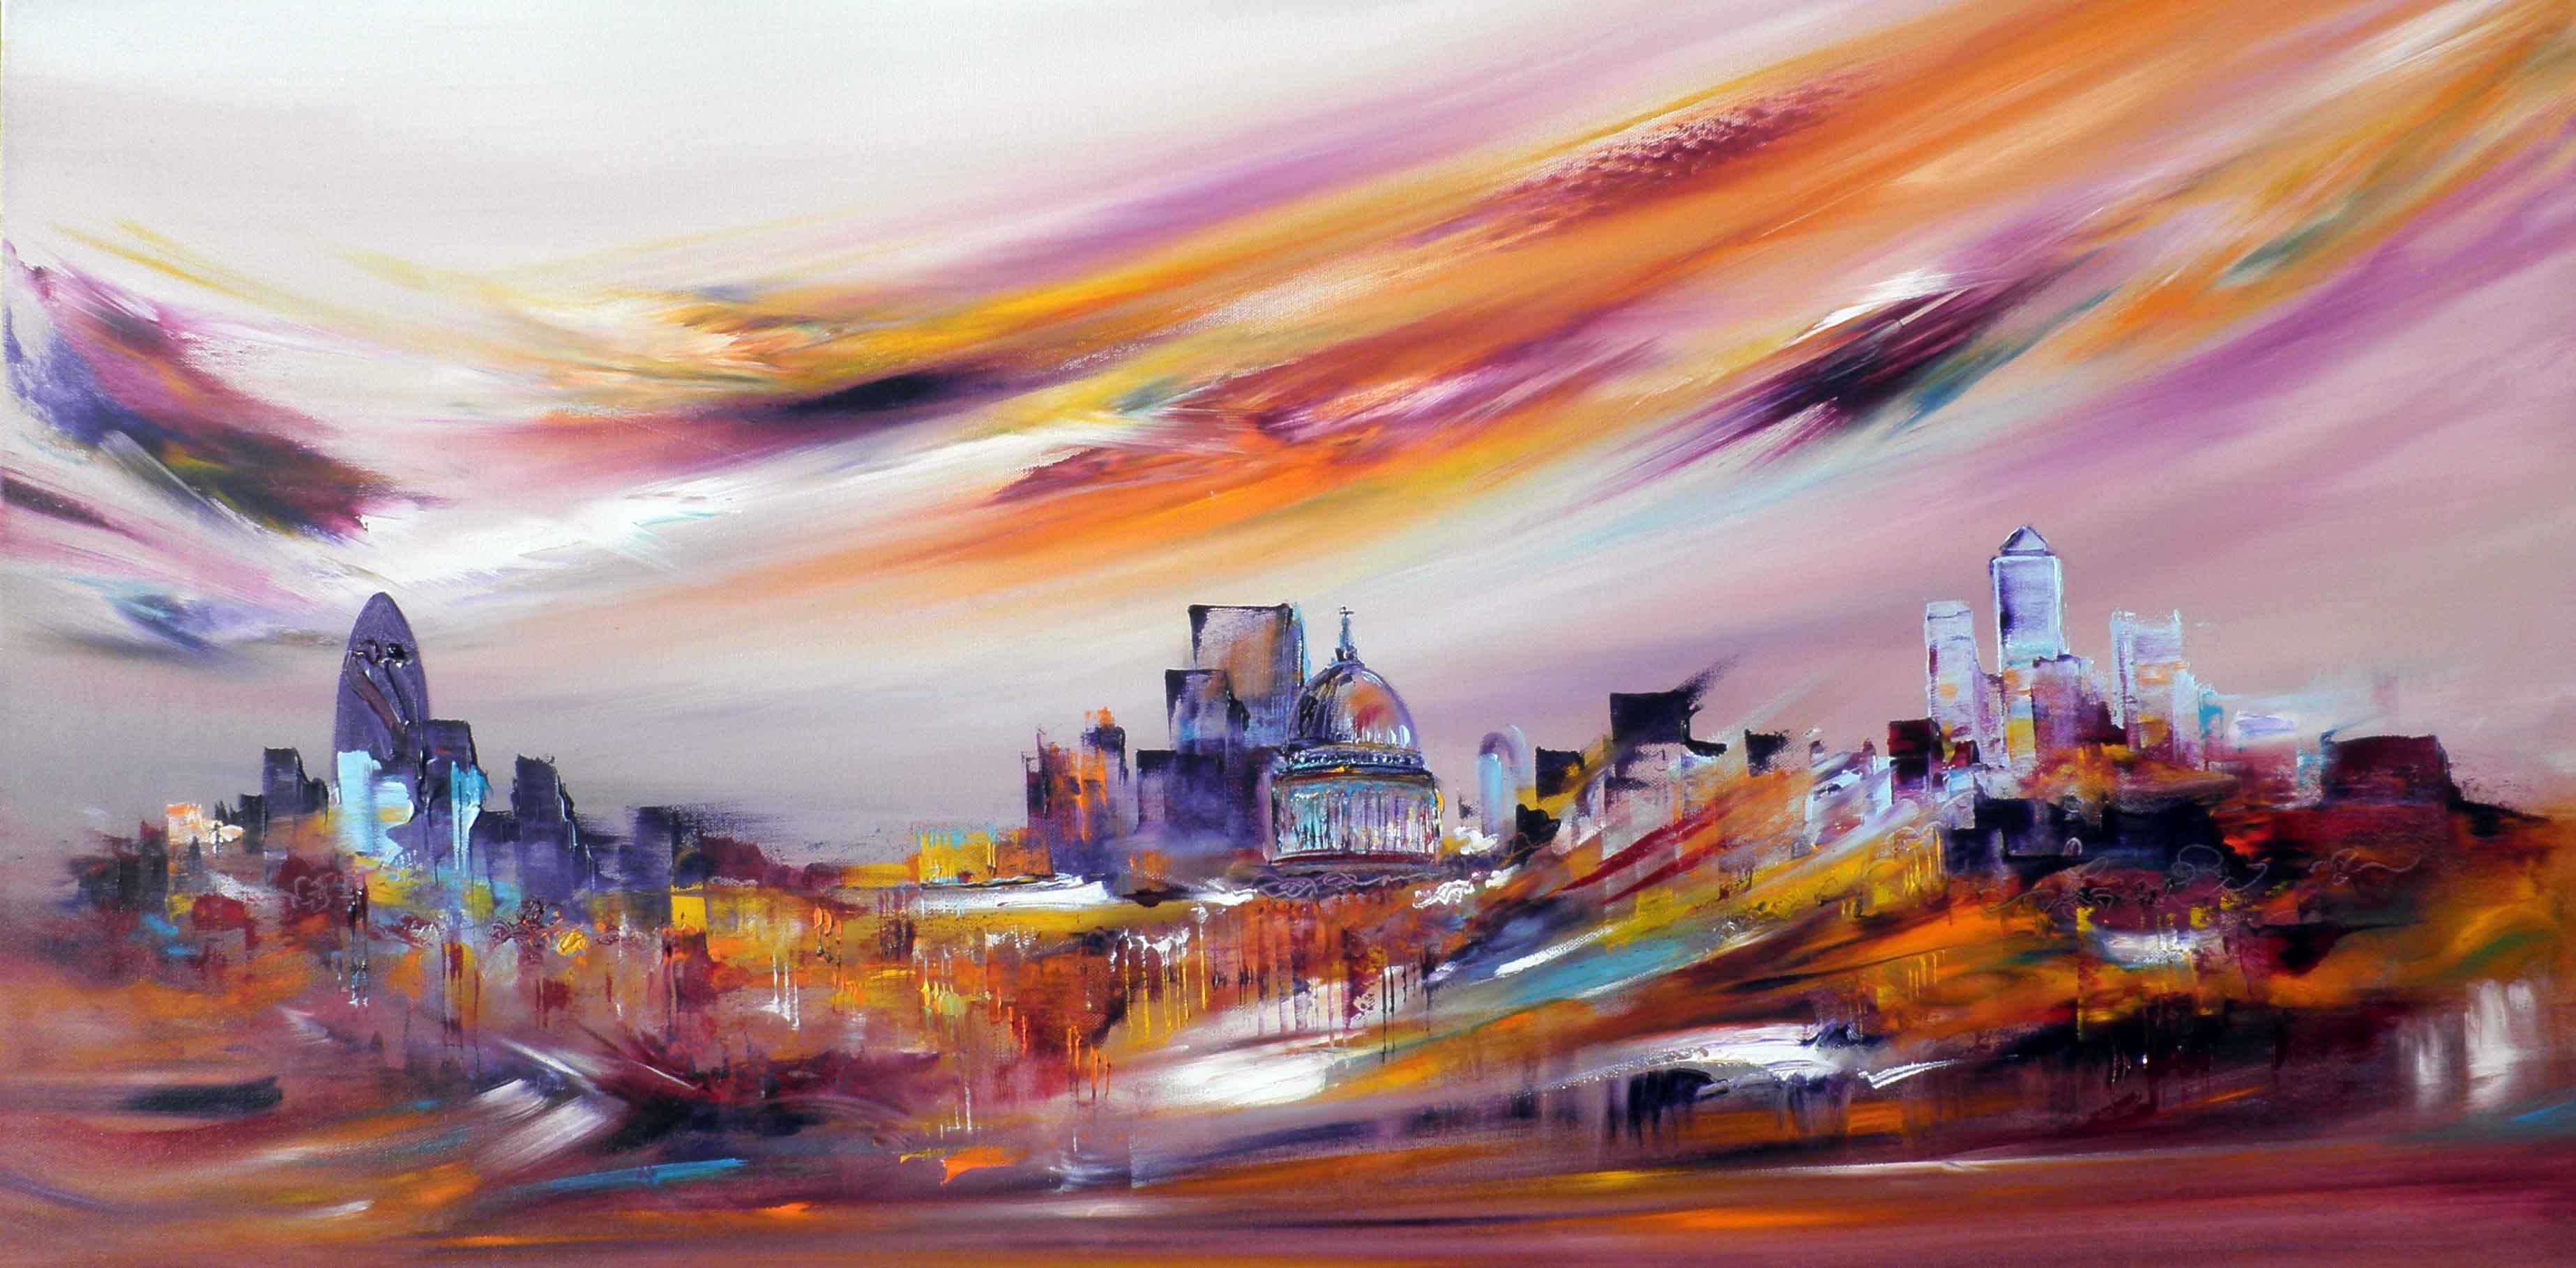 Rainbow Everywhere by Sara Sherwood